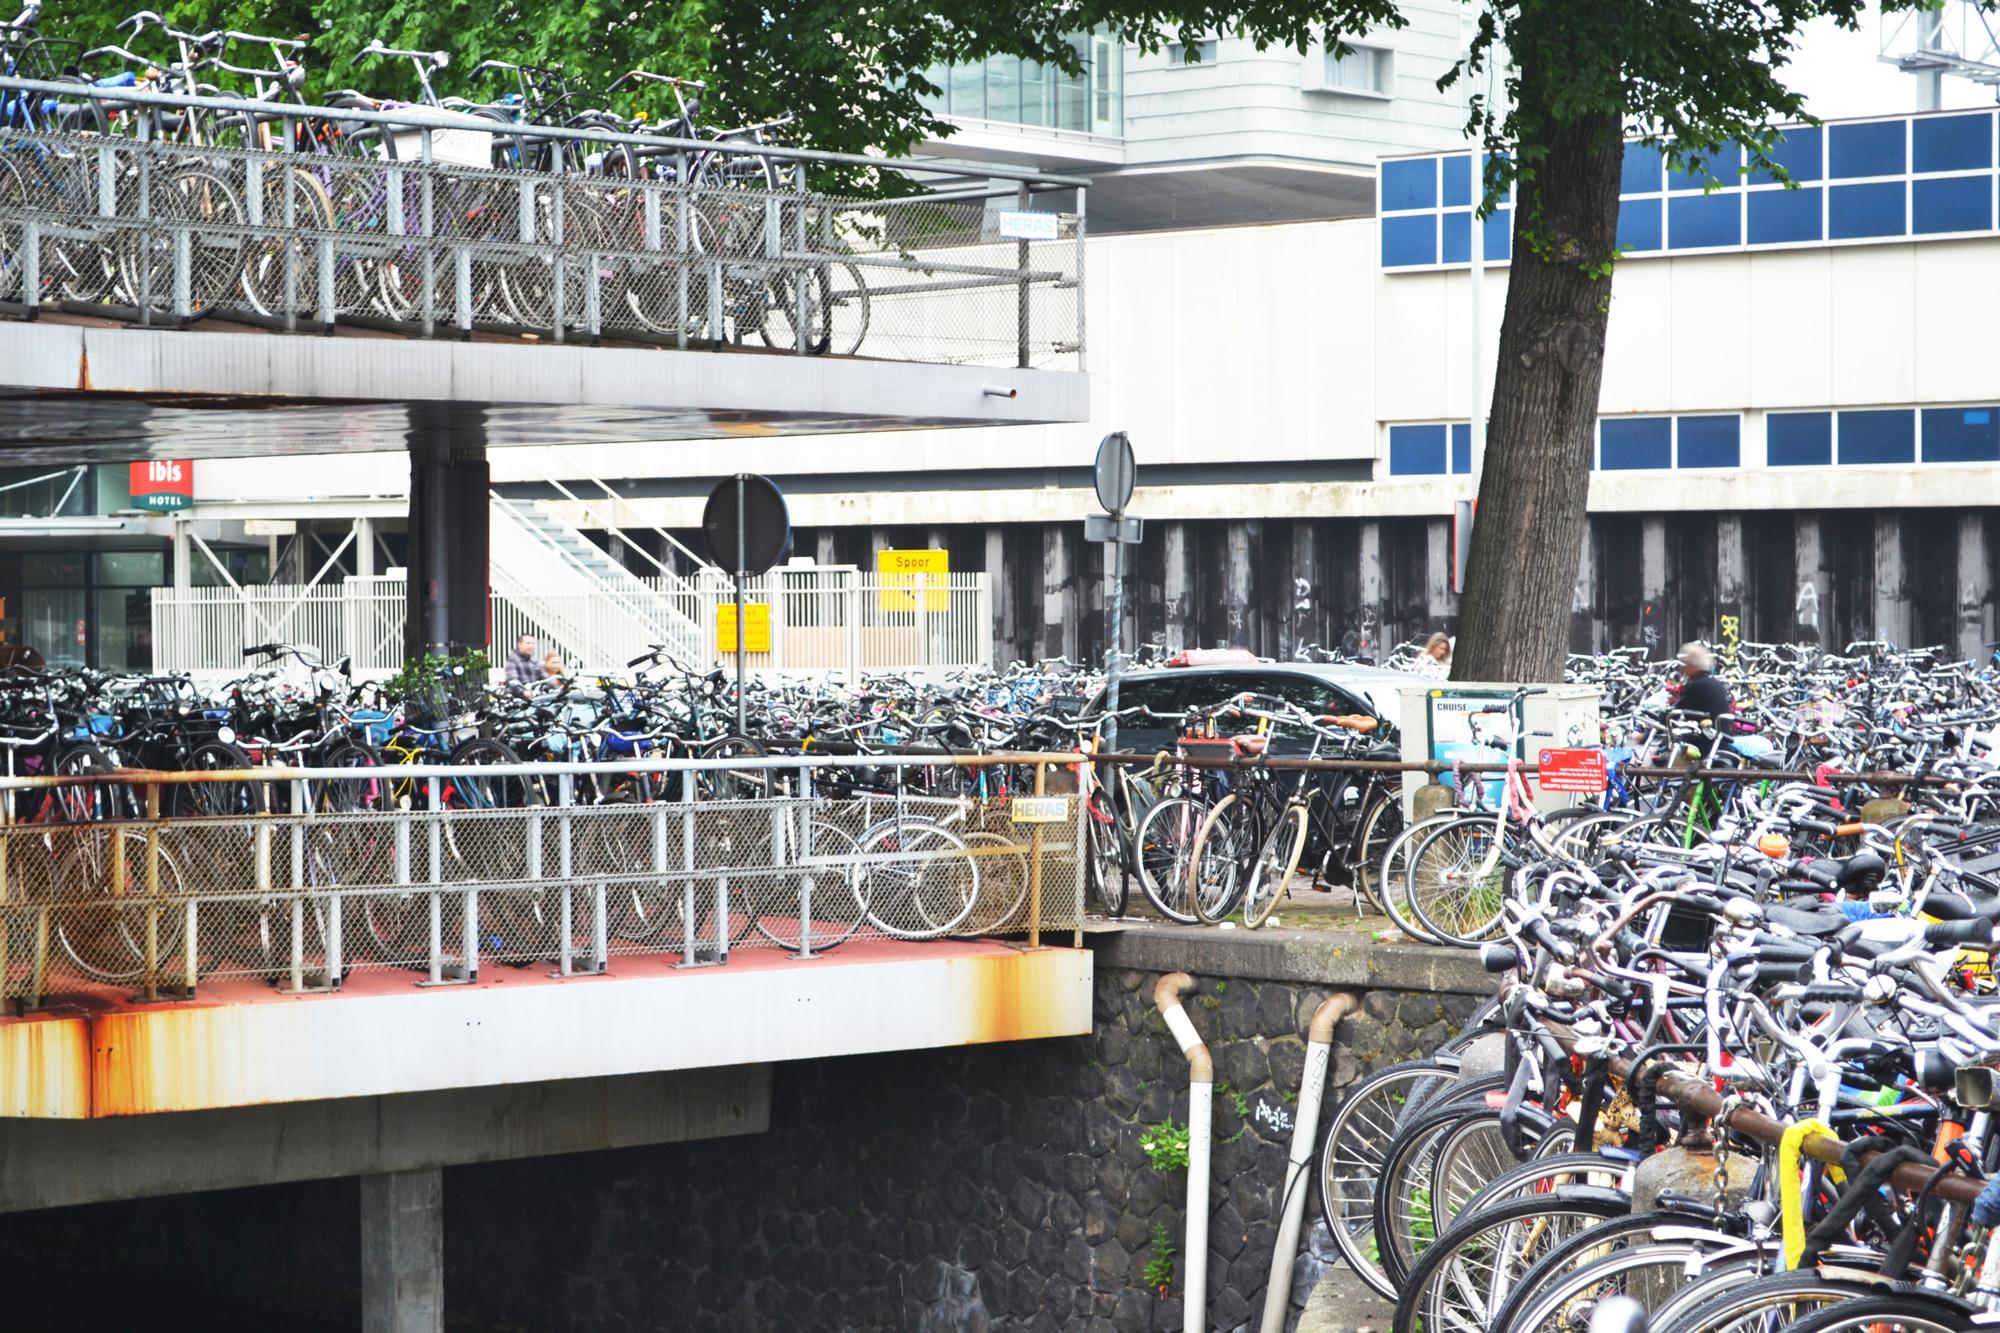 urbanbacklog-amsterdam-bicycle-city-4.jpg